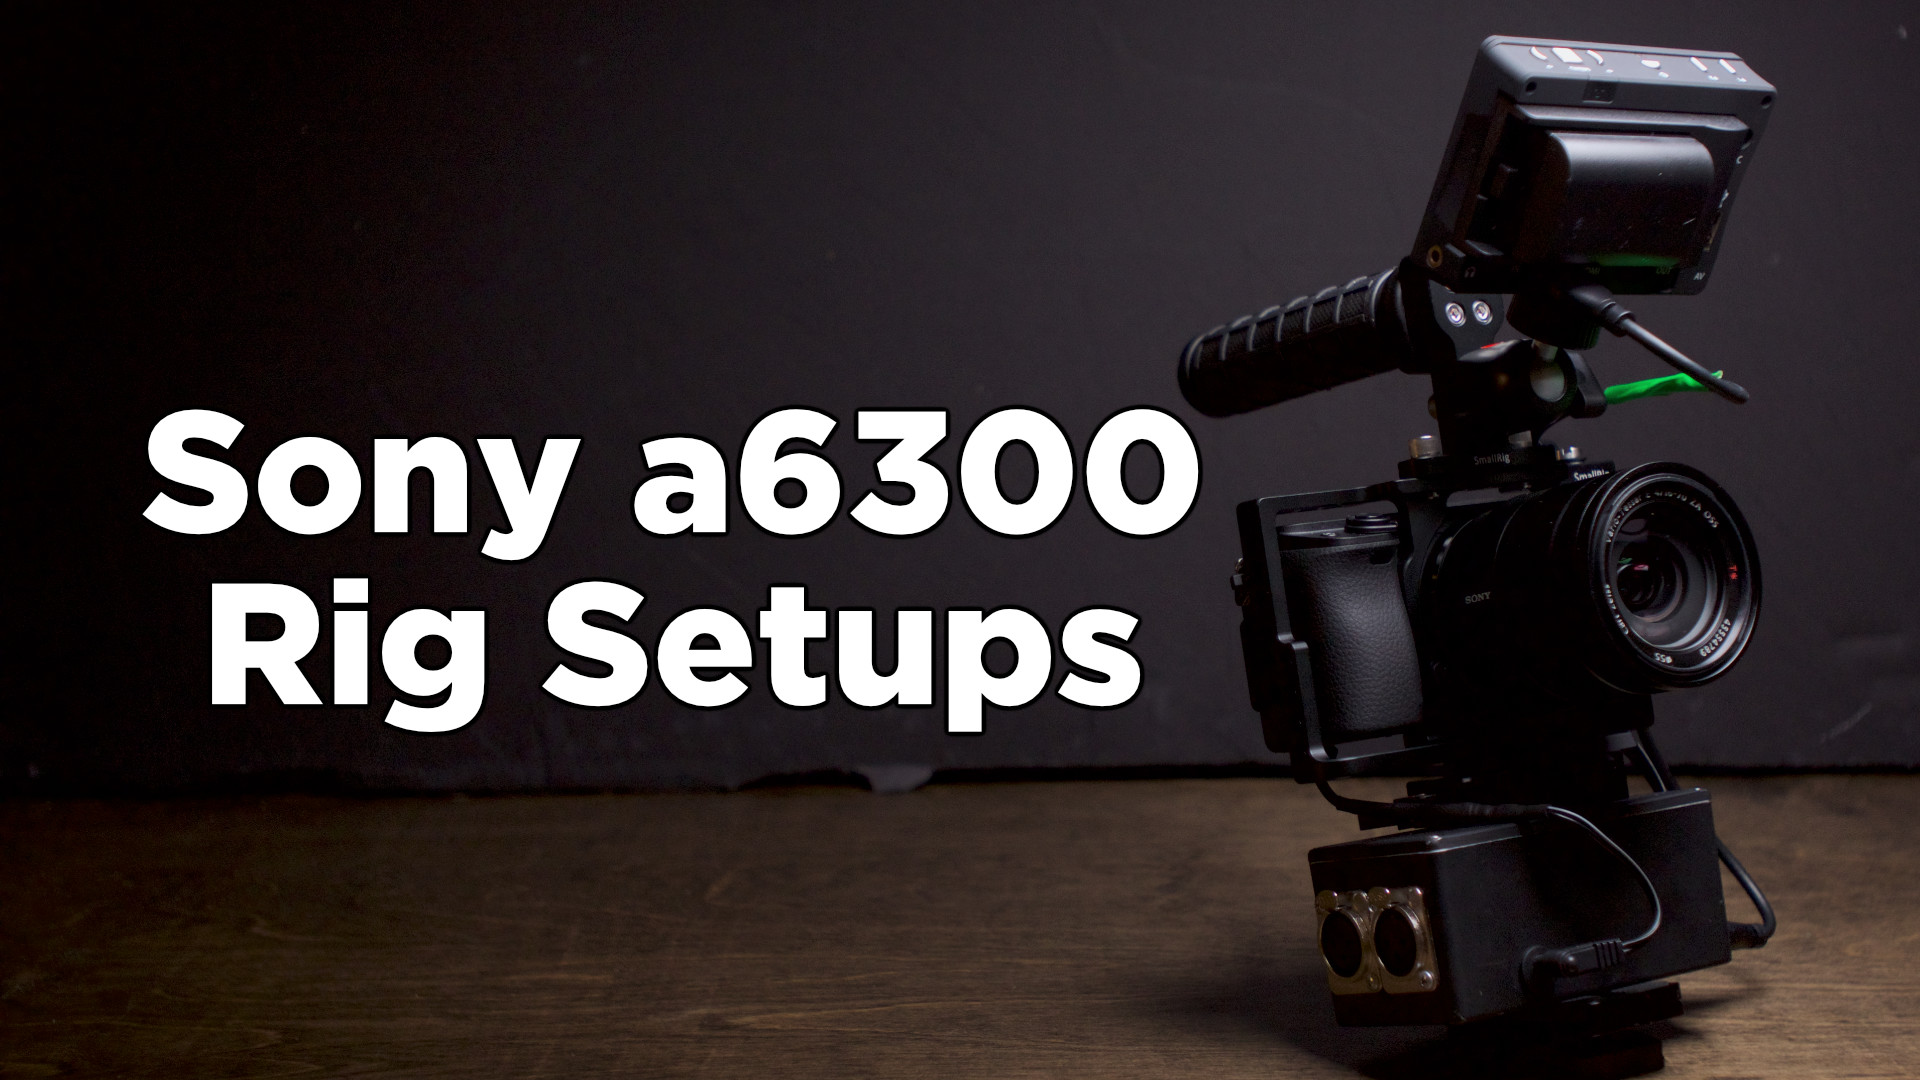 Sony a6300 Custom Rig Setups